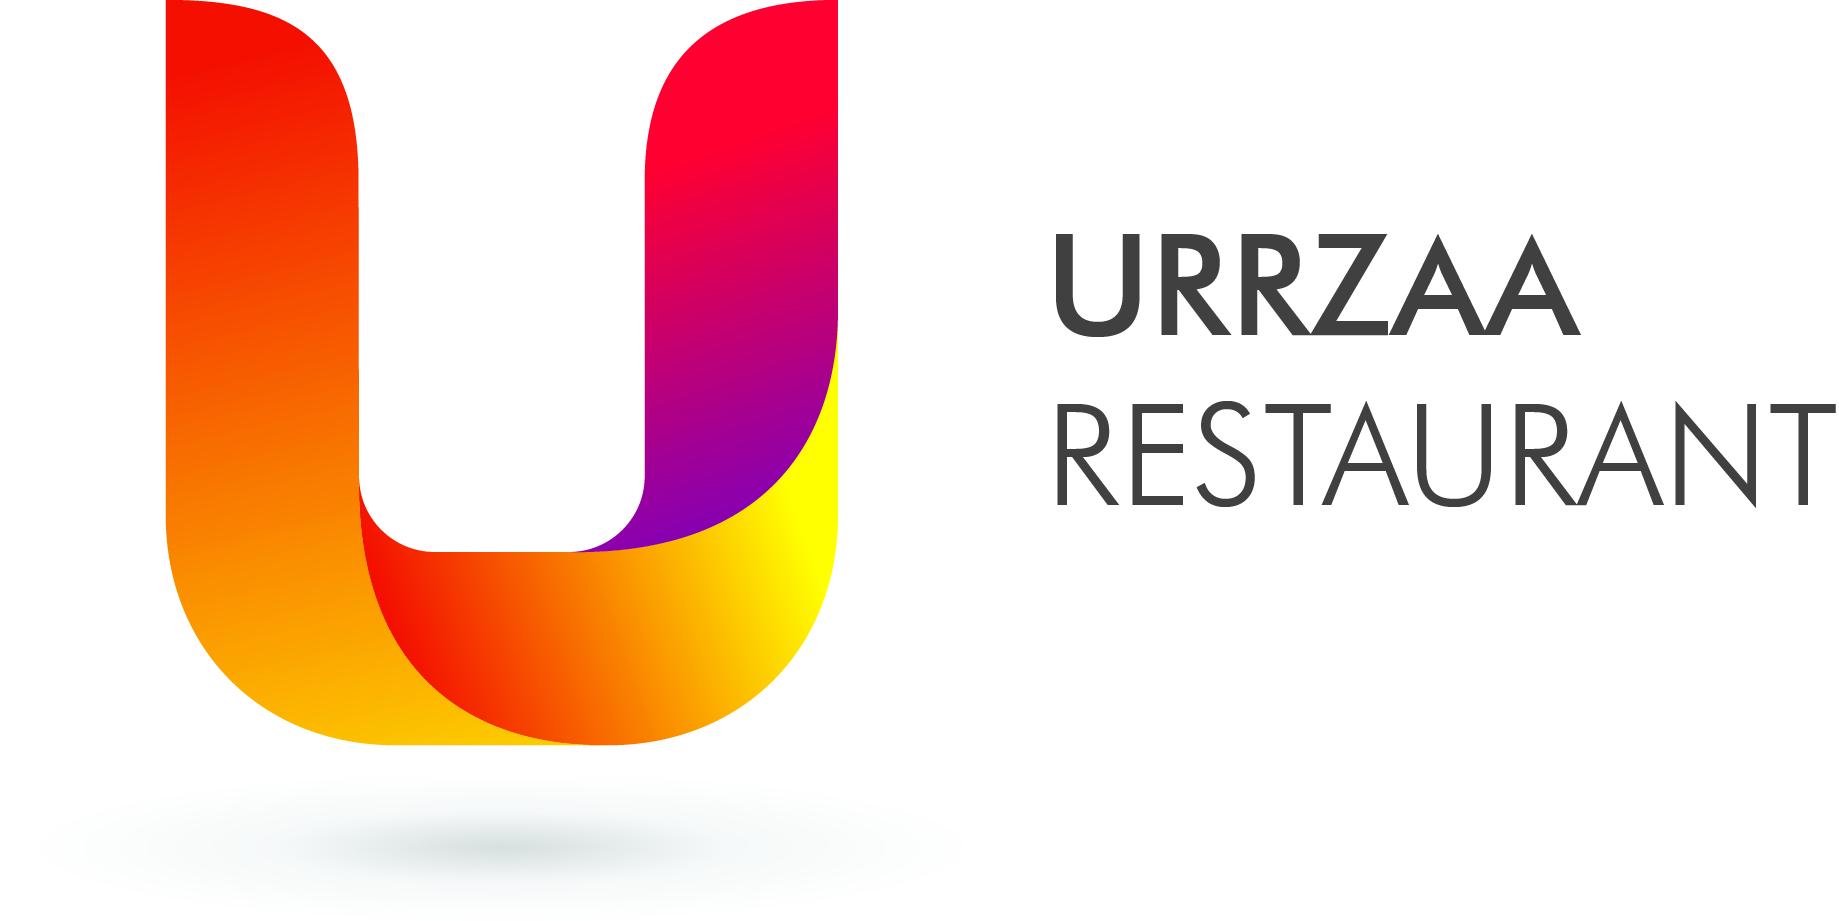 Urrzza Restaurant